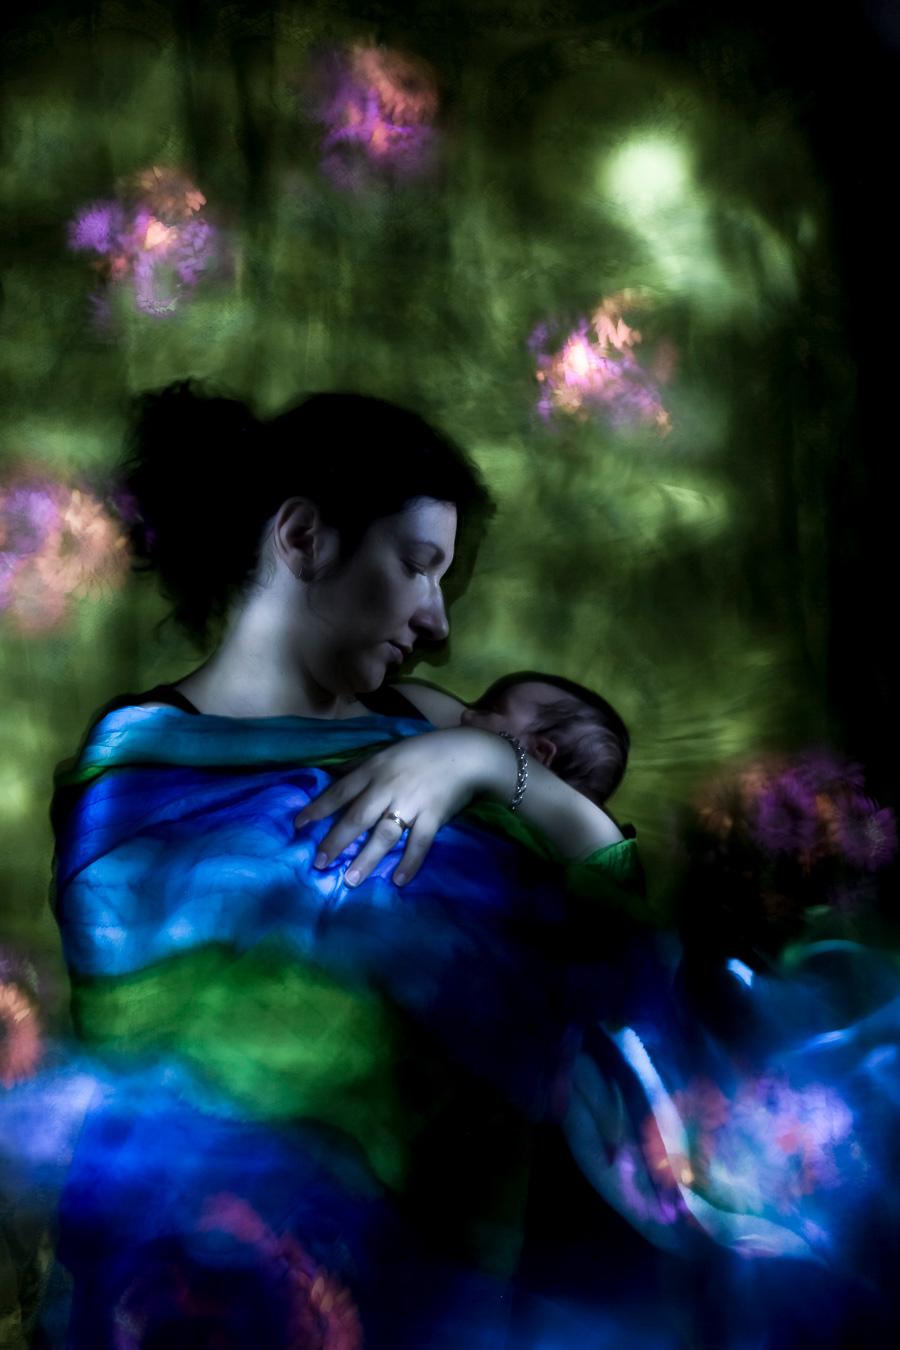 Madonna con bambina, ritatto newborn in light painting,